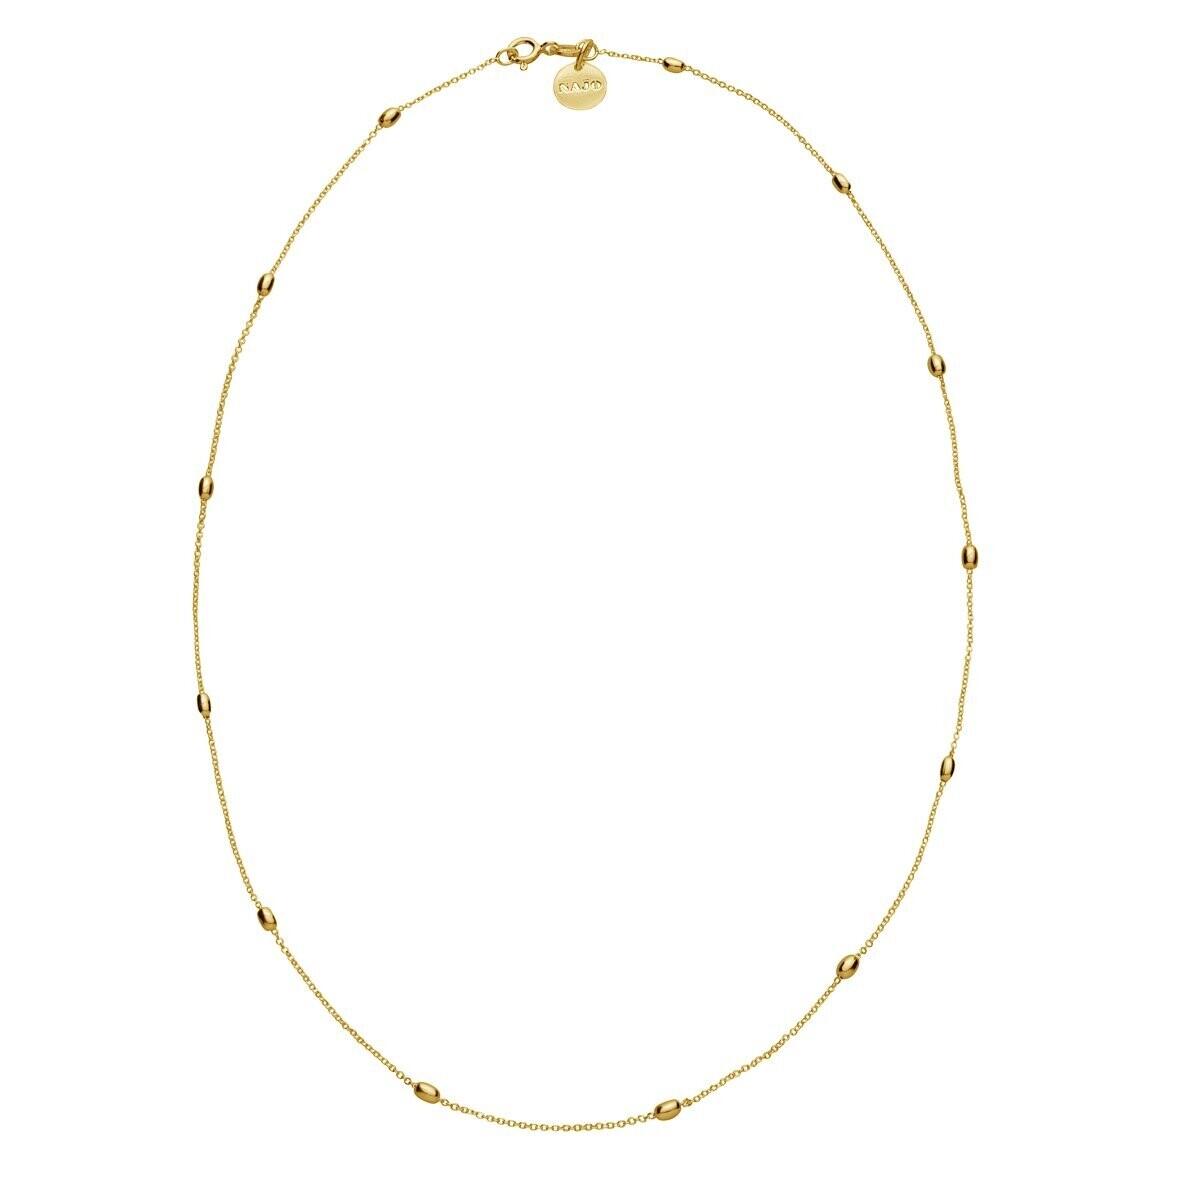 Najo - Like a Breeze Necklace - Gold